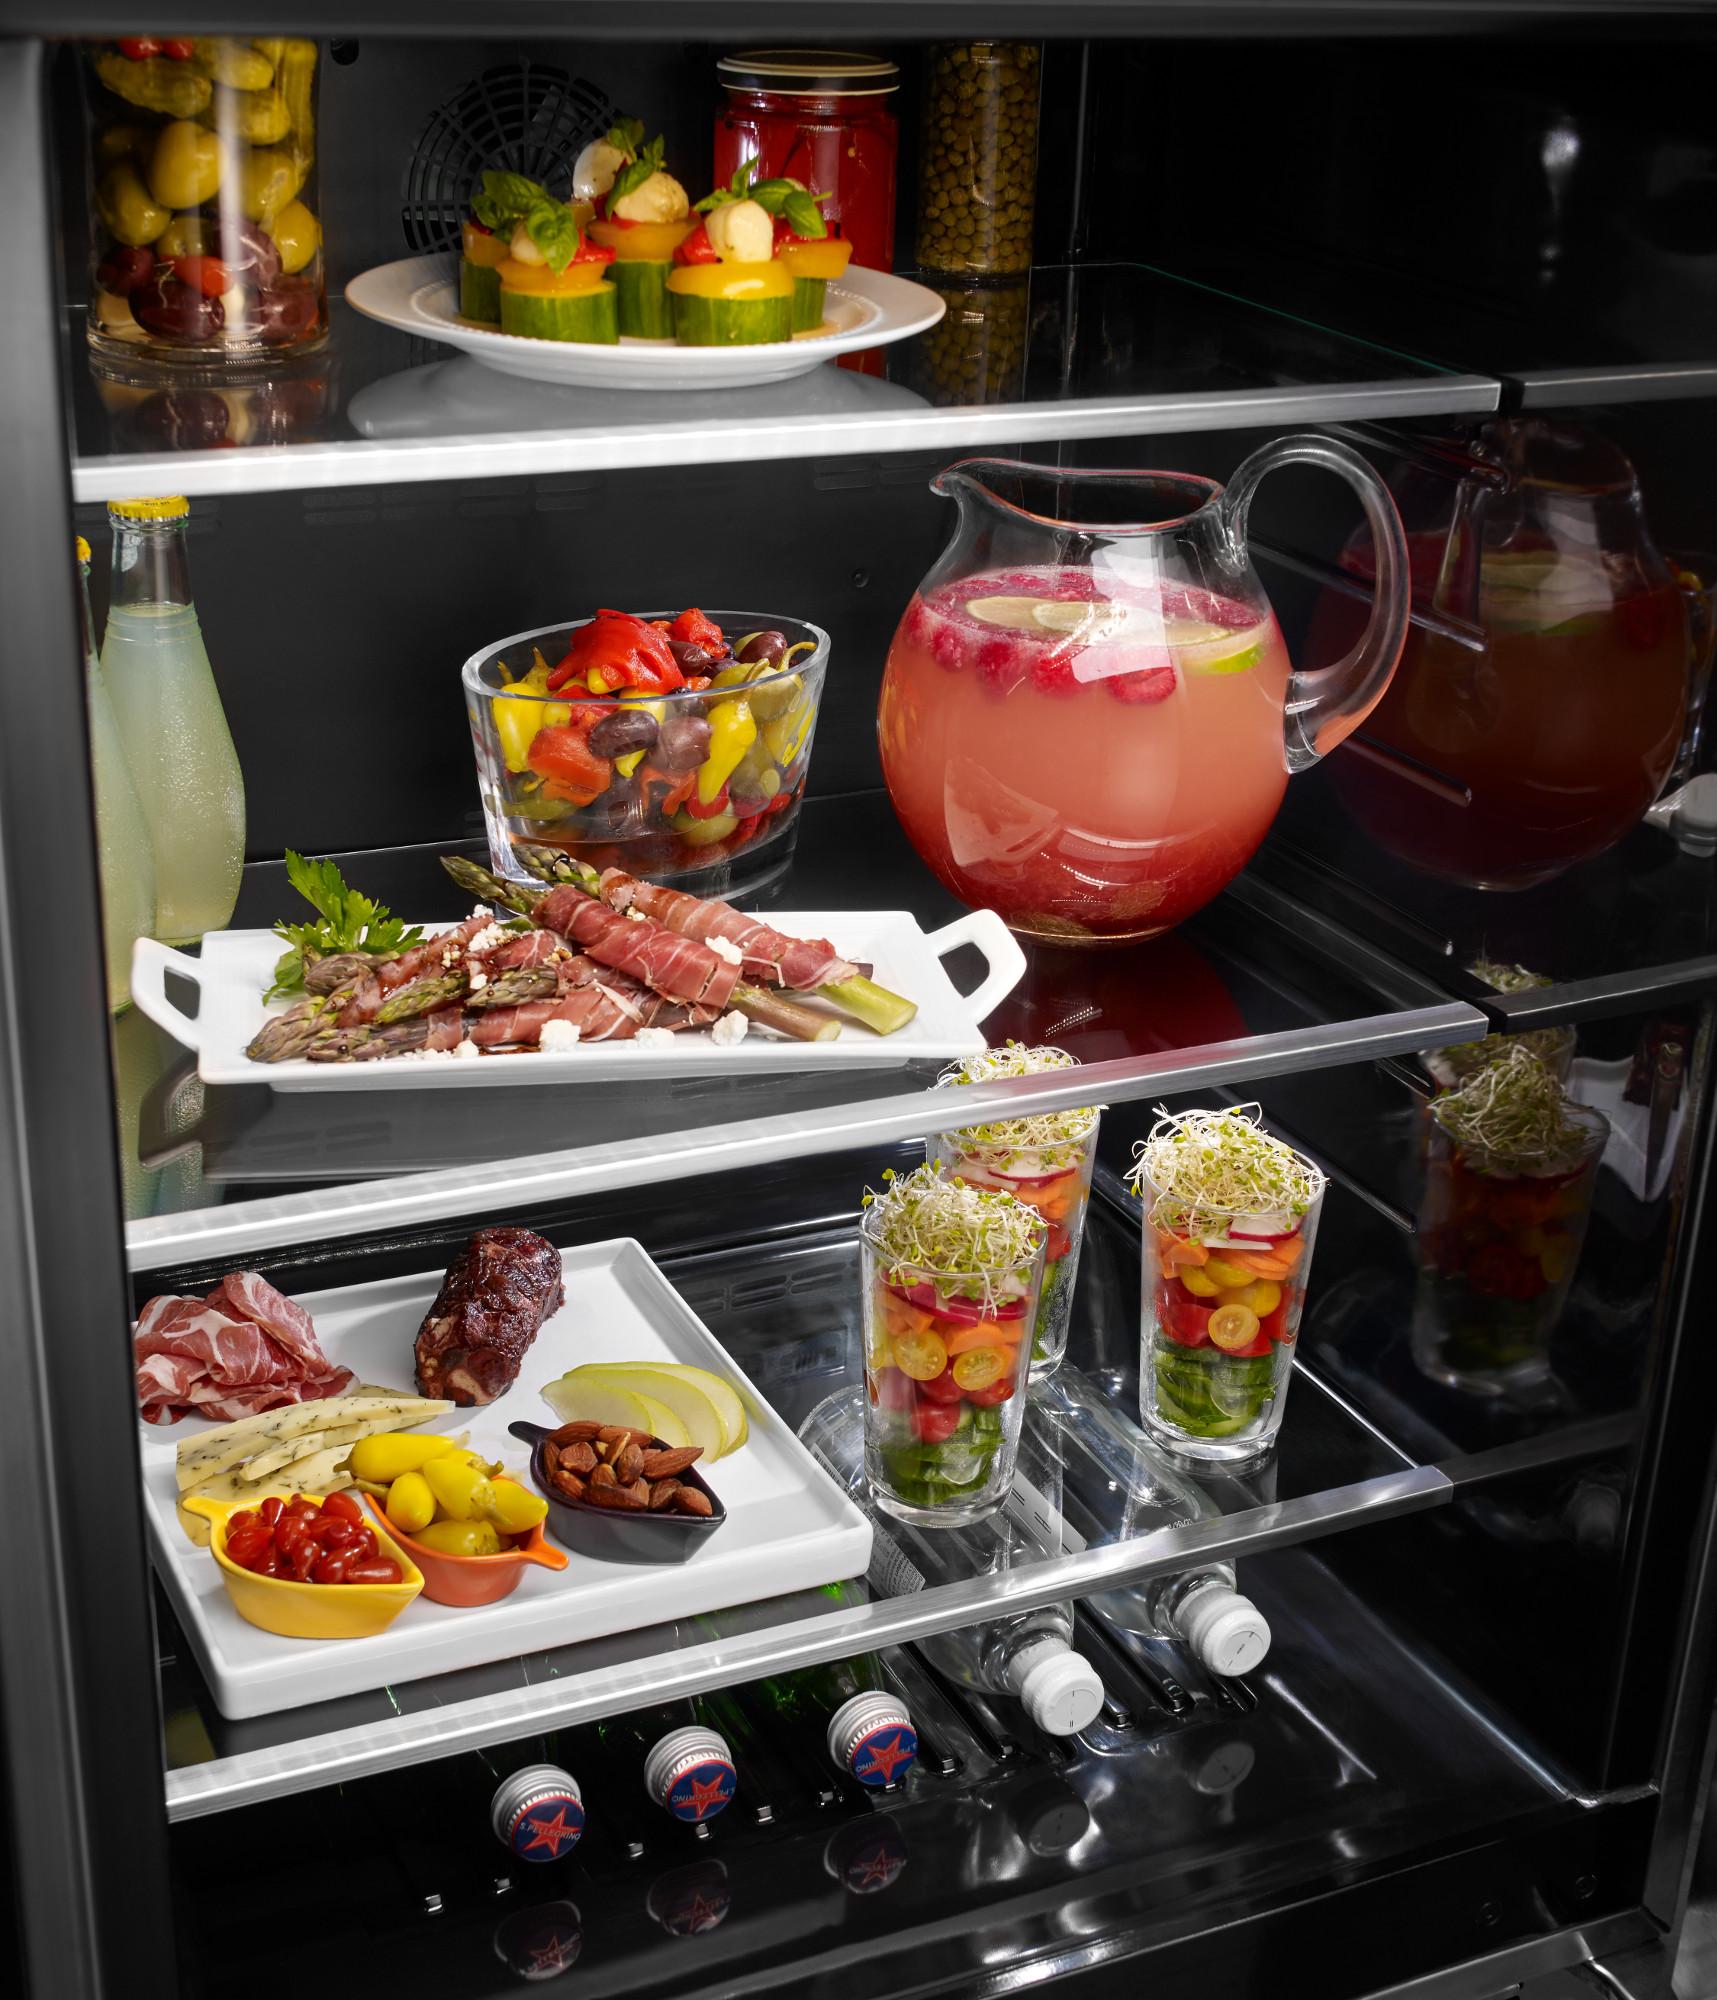 KitchenAid KURL304ESS 5.1 cu. ft  Left Swing Undercounter Refrigerator with Glass Door - Stainless Steel